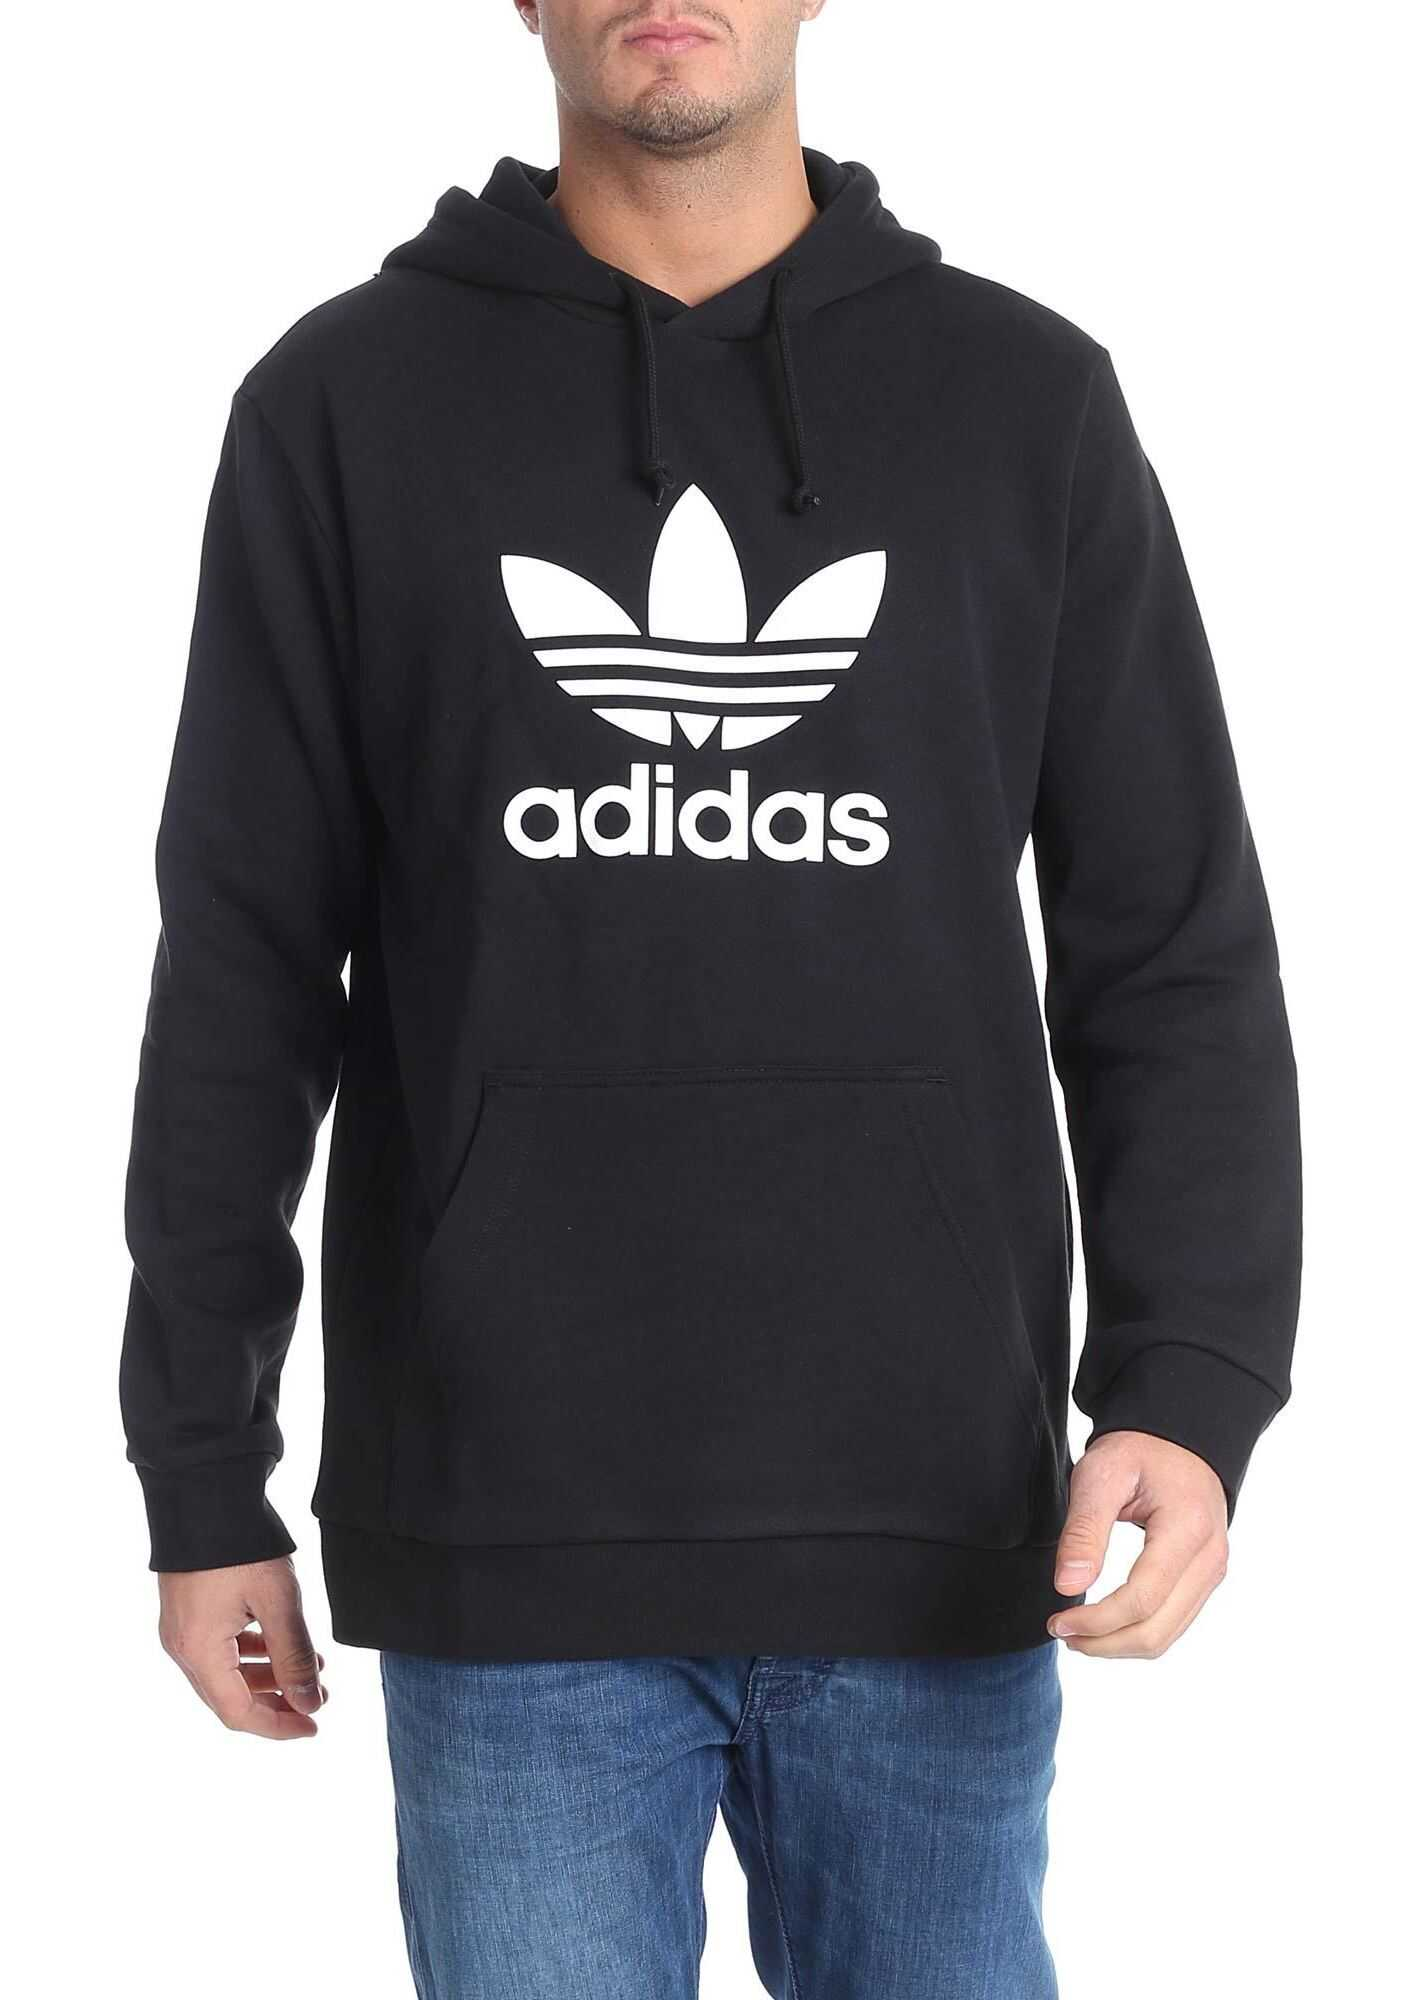 adidas Adidas Originals Trefoil Swatshirt In Black Black